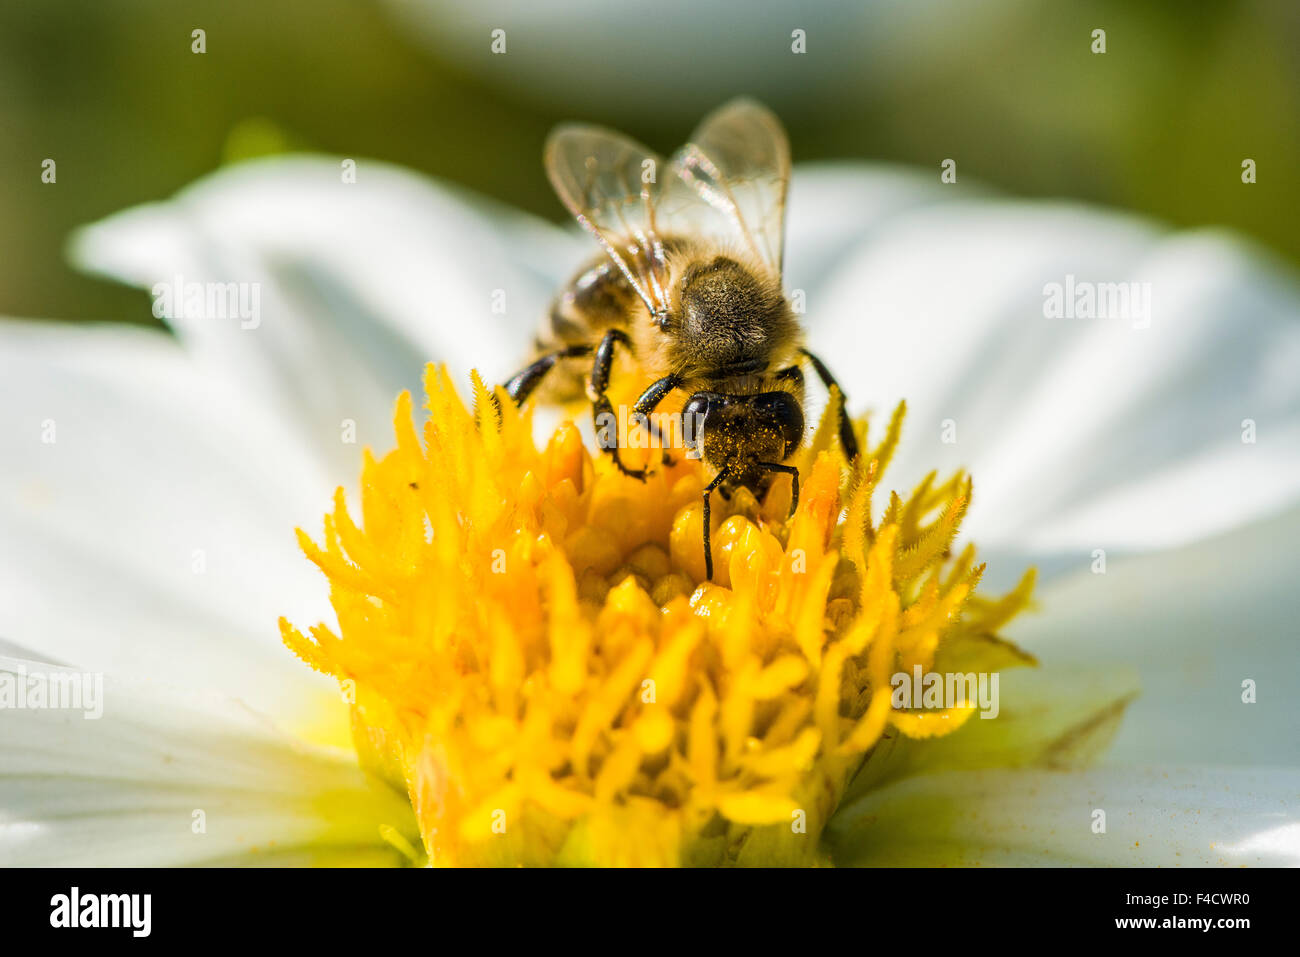 Un carniolan de abejas (Apis mellifera Carnica) está recogiendo el néctar de una flor Dalia (Asteraceae) Foto de stock